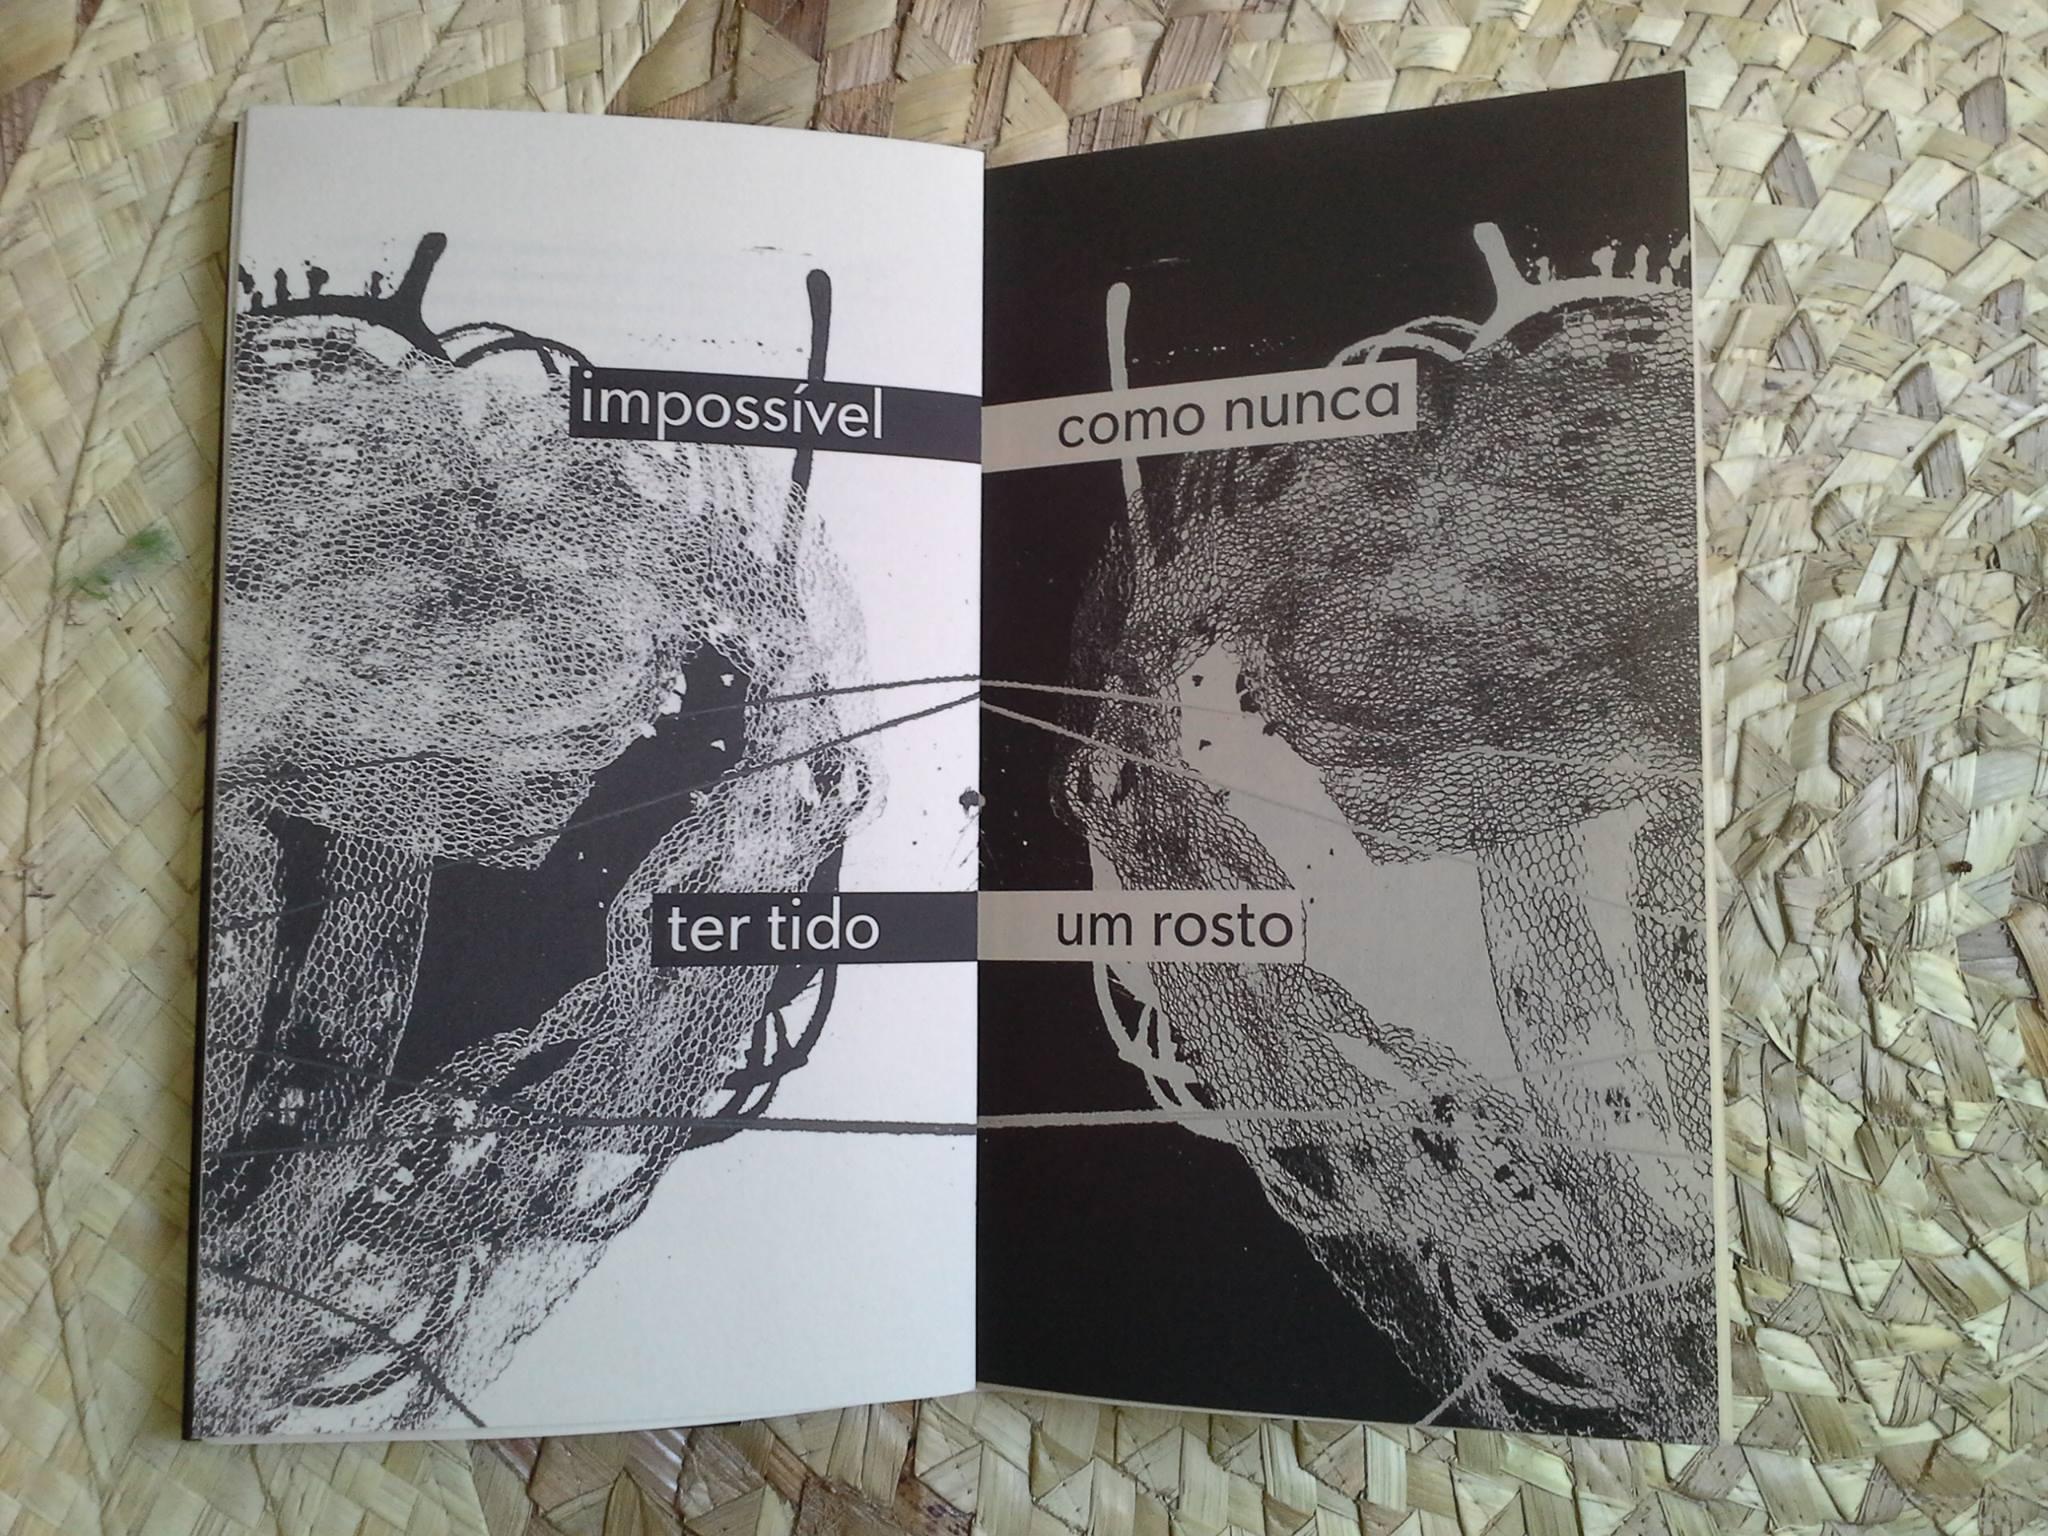 ricardo_aleixo_foto_prova1